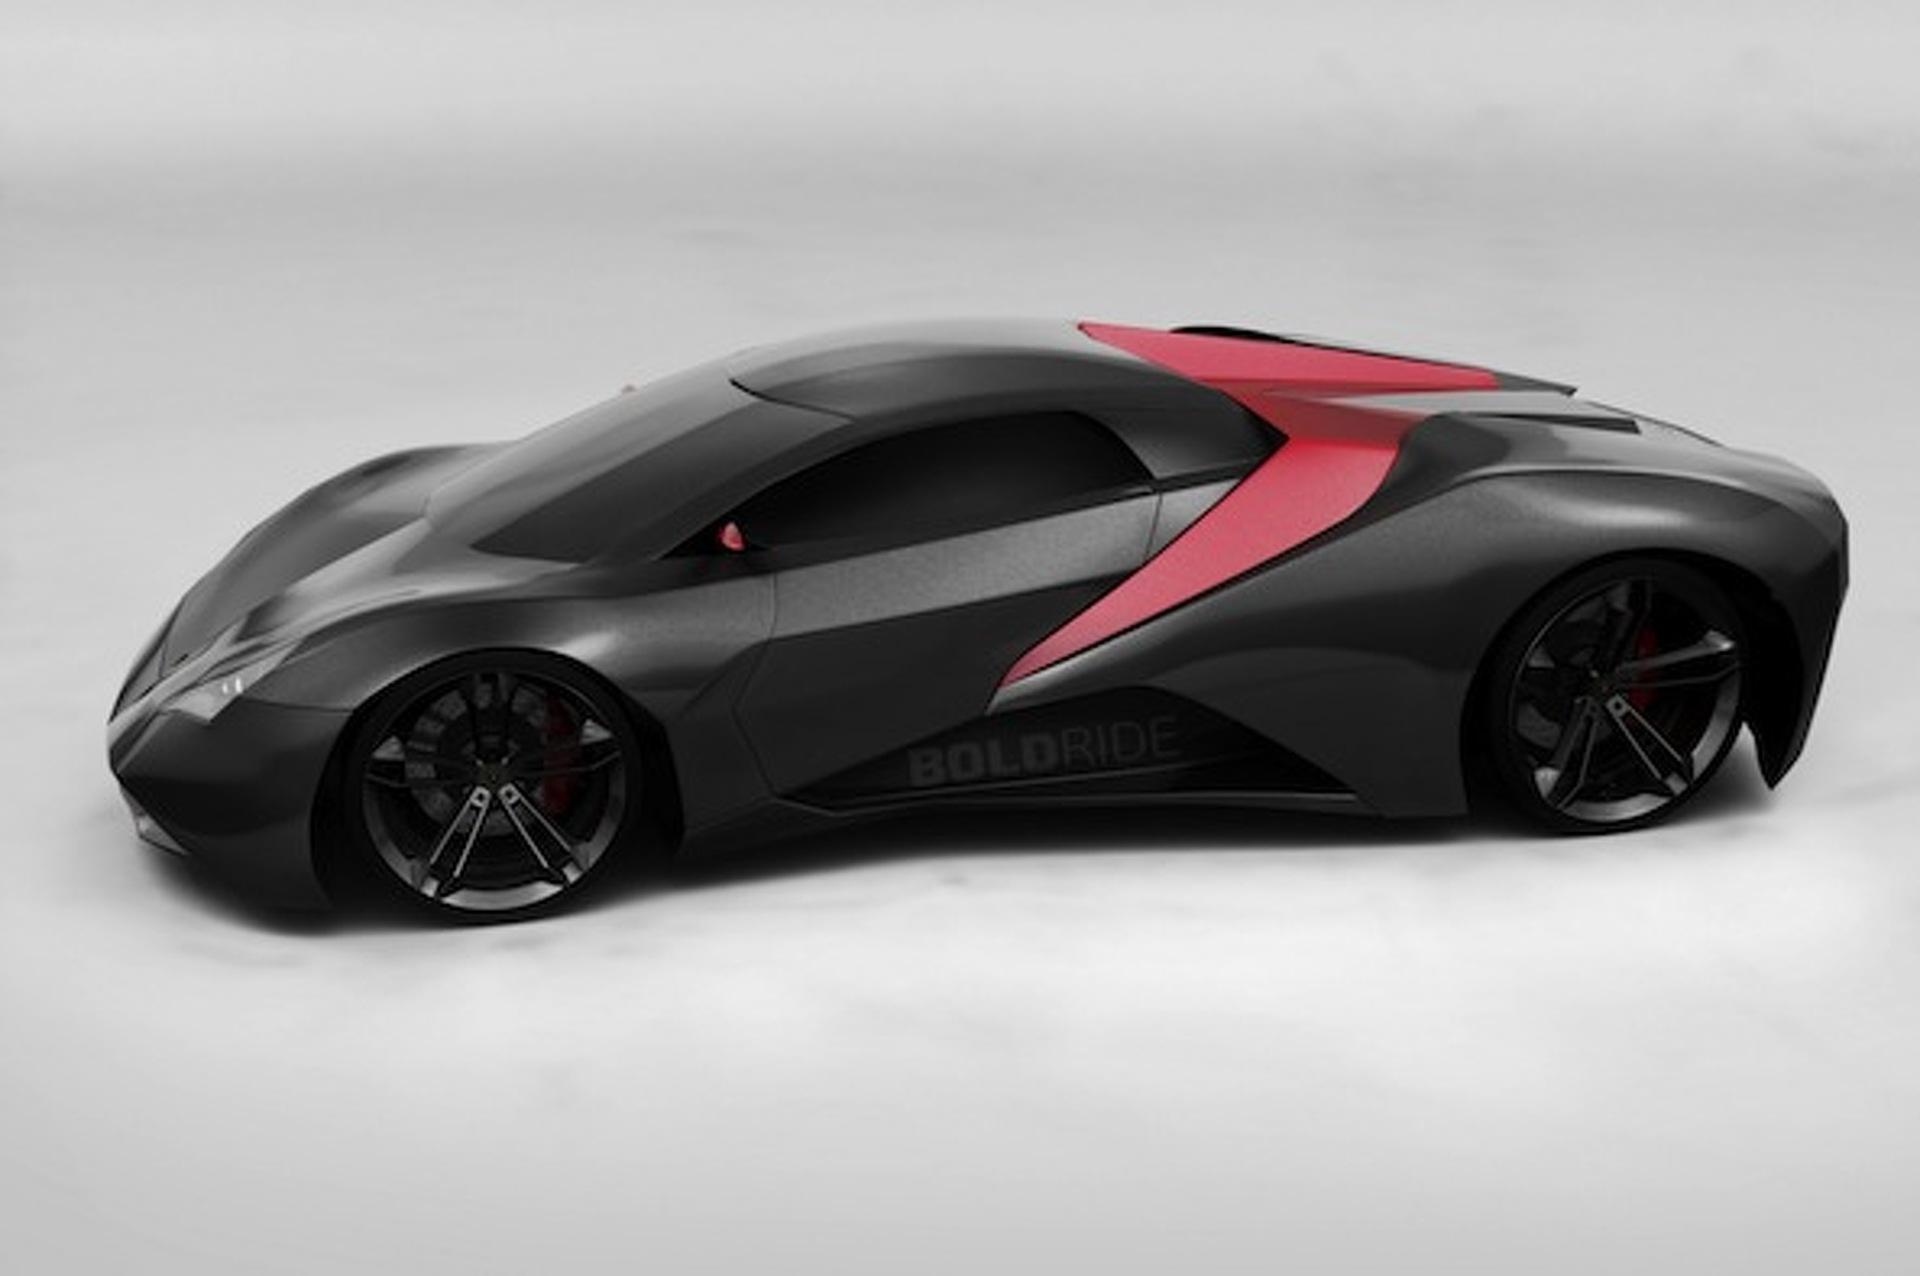 Lamborghini Dynavonto: An Aerodynamic Force of Engineering